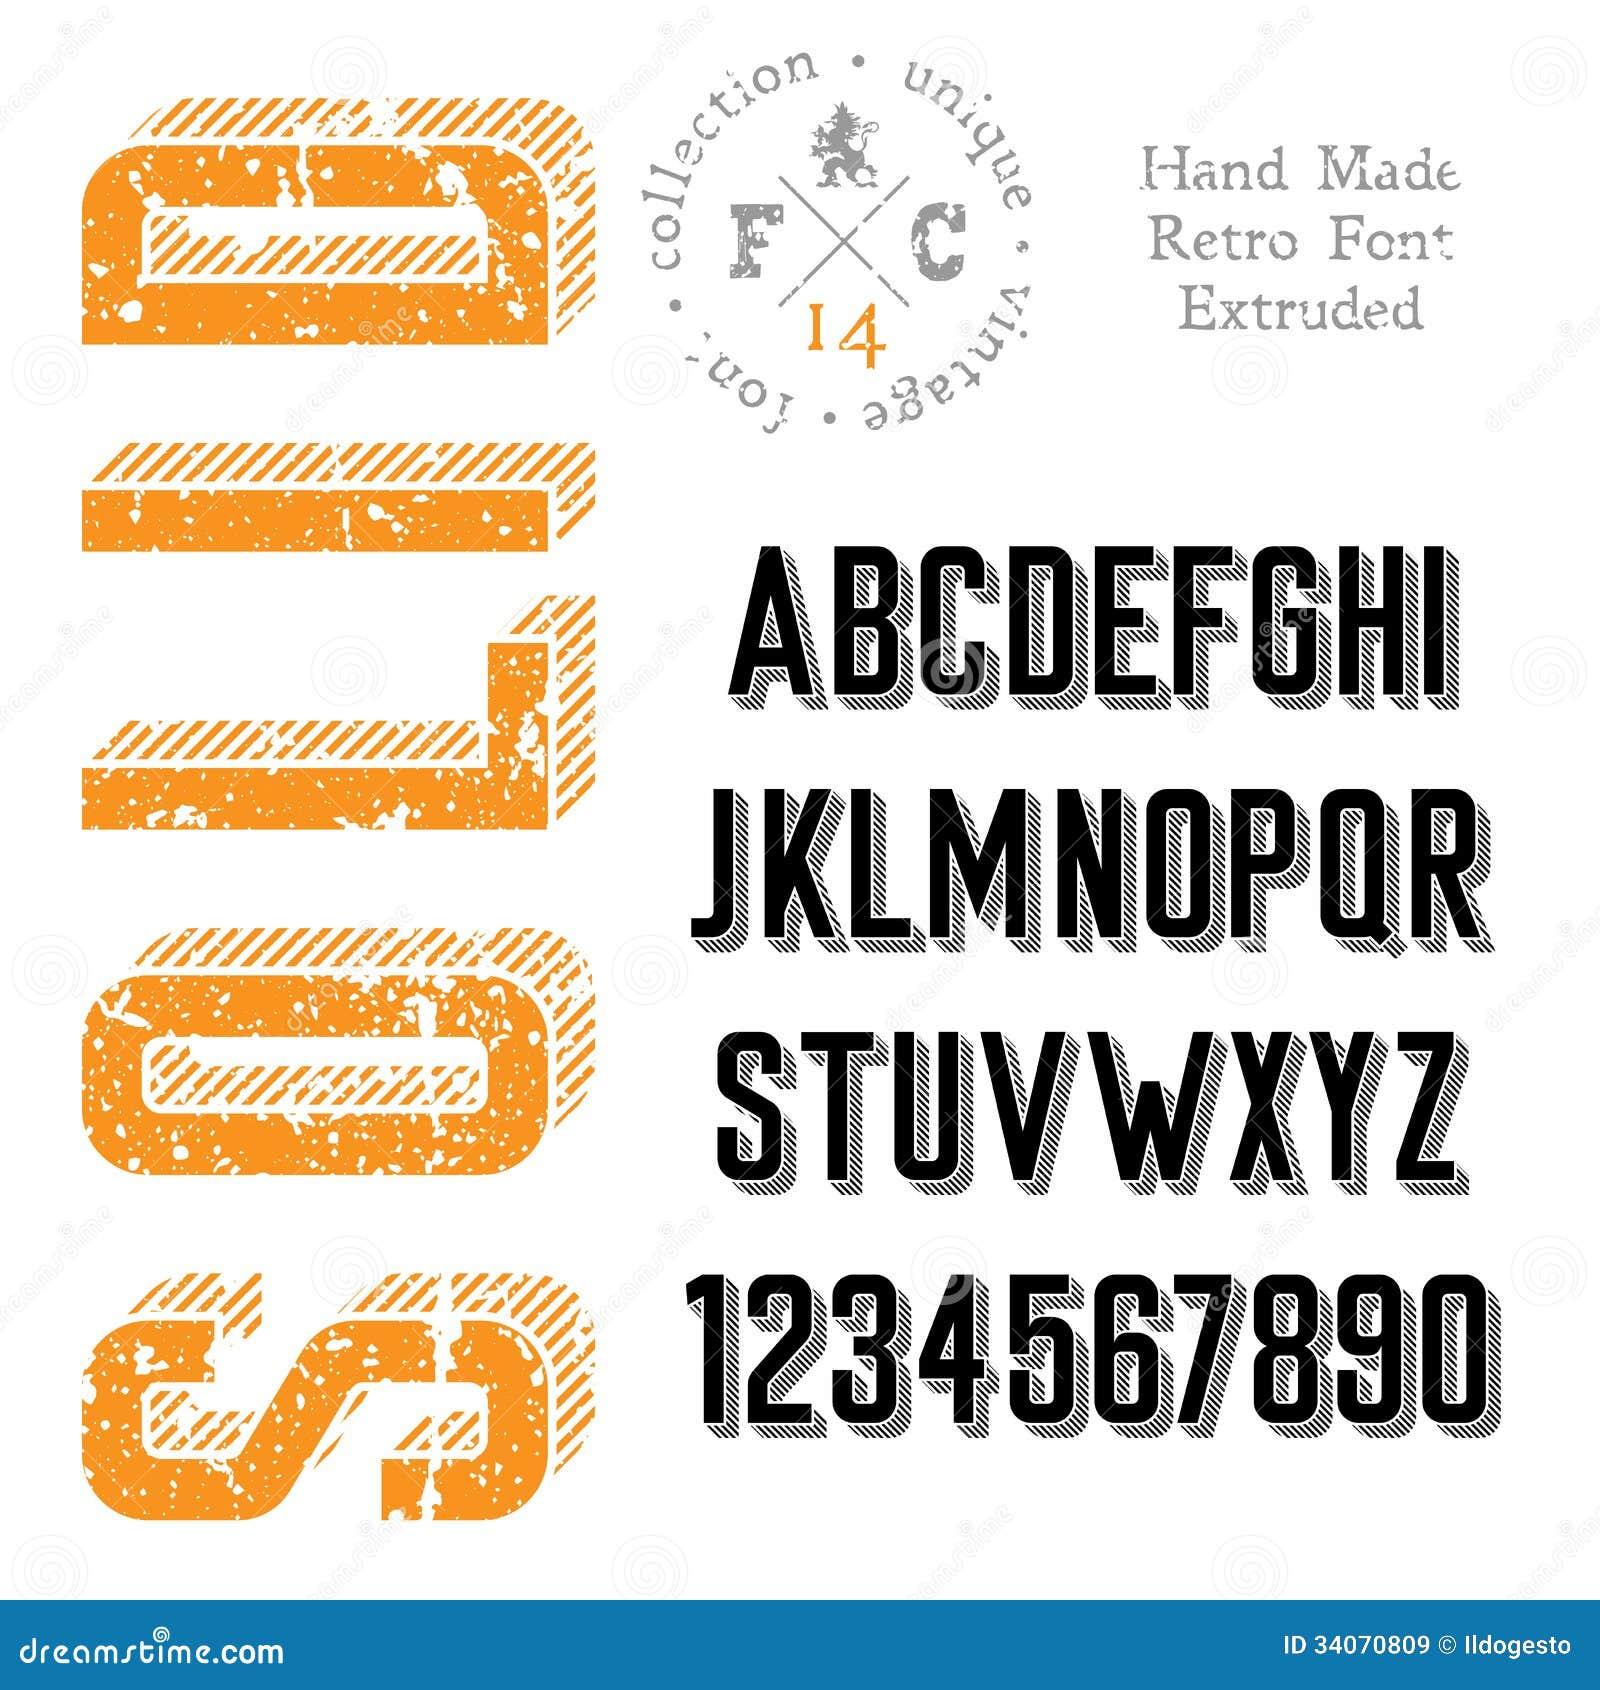 Handmade Retro Font Royalty Free Stock Images